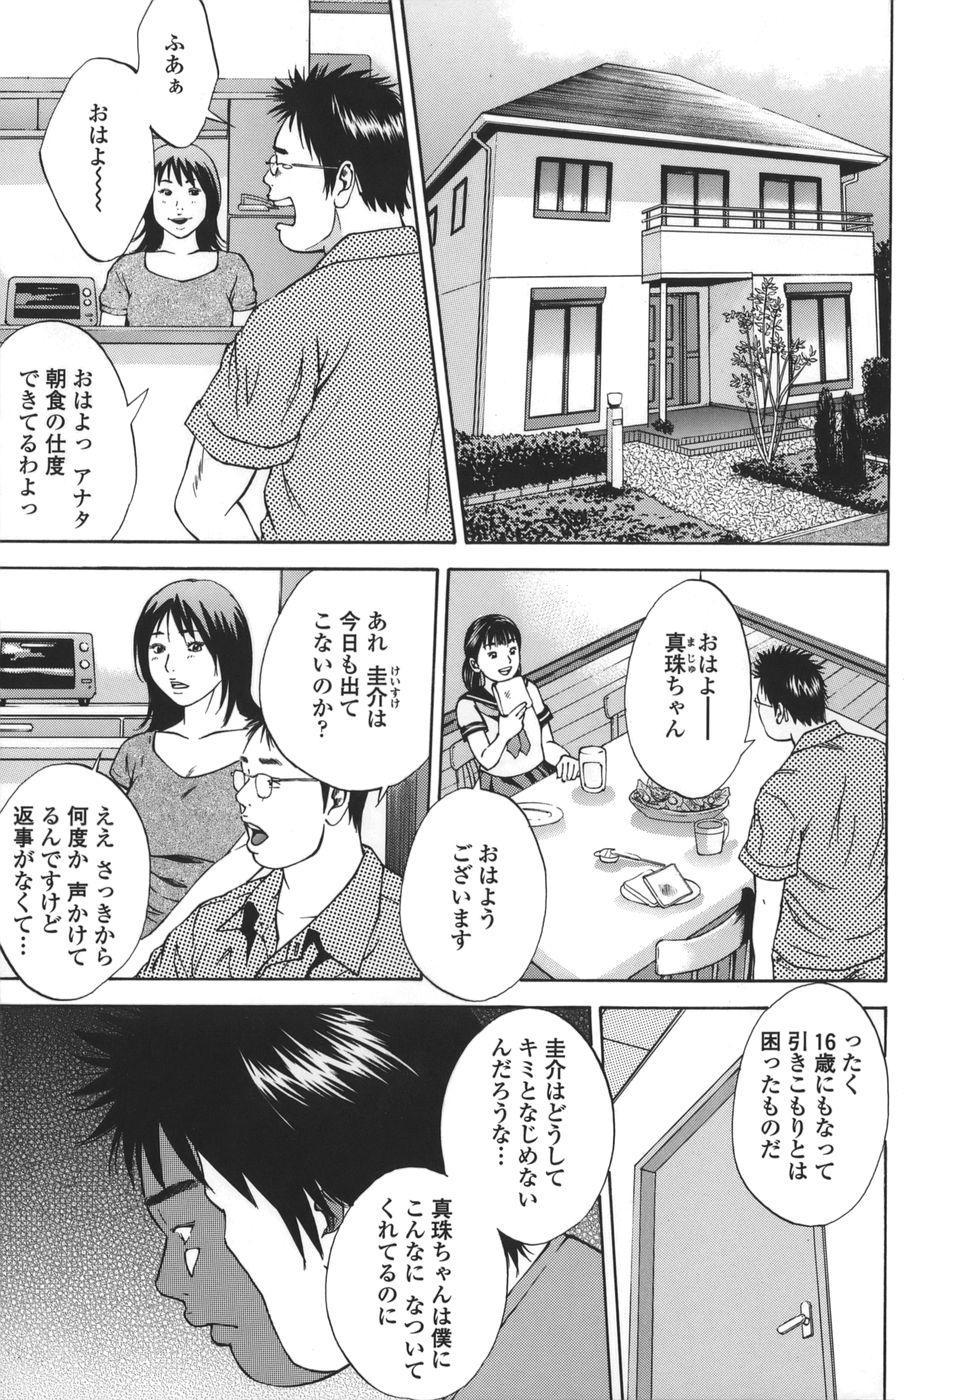 Kinshin Goukan - Near Relation Rapes 6